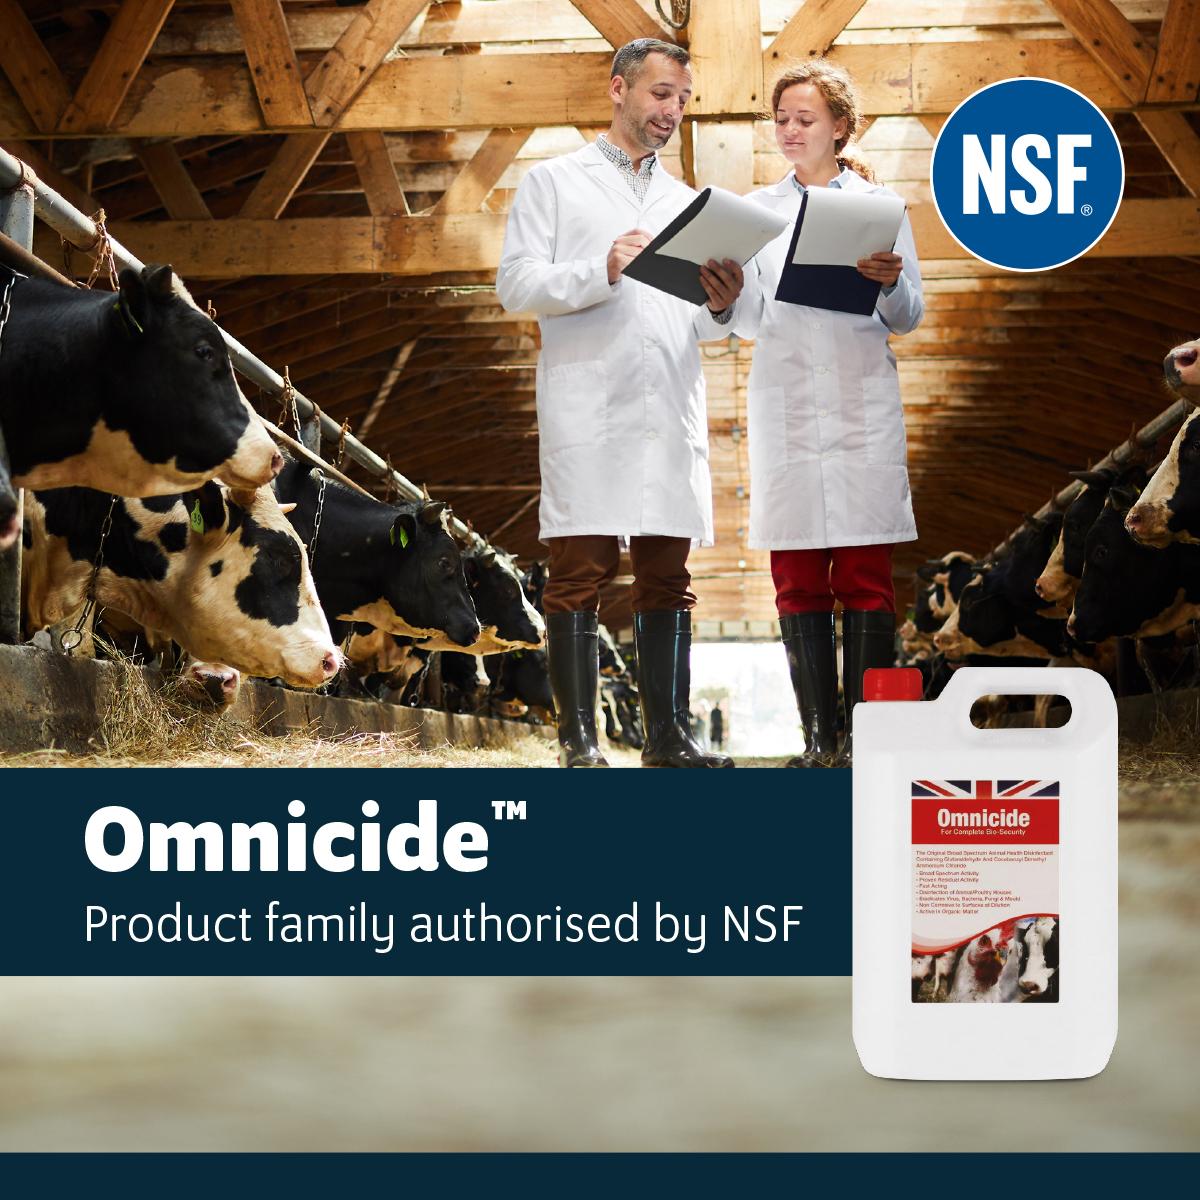 Omnicide™, Omnicide™ FG and Omnicide™ FG II Authorised to Bear the NSF Registration Mark